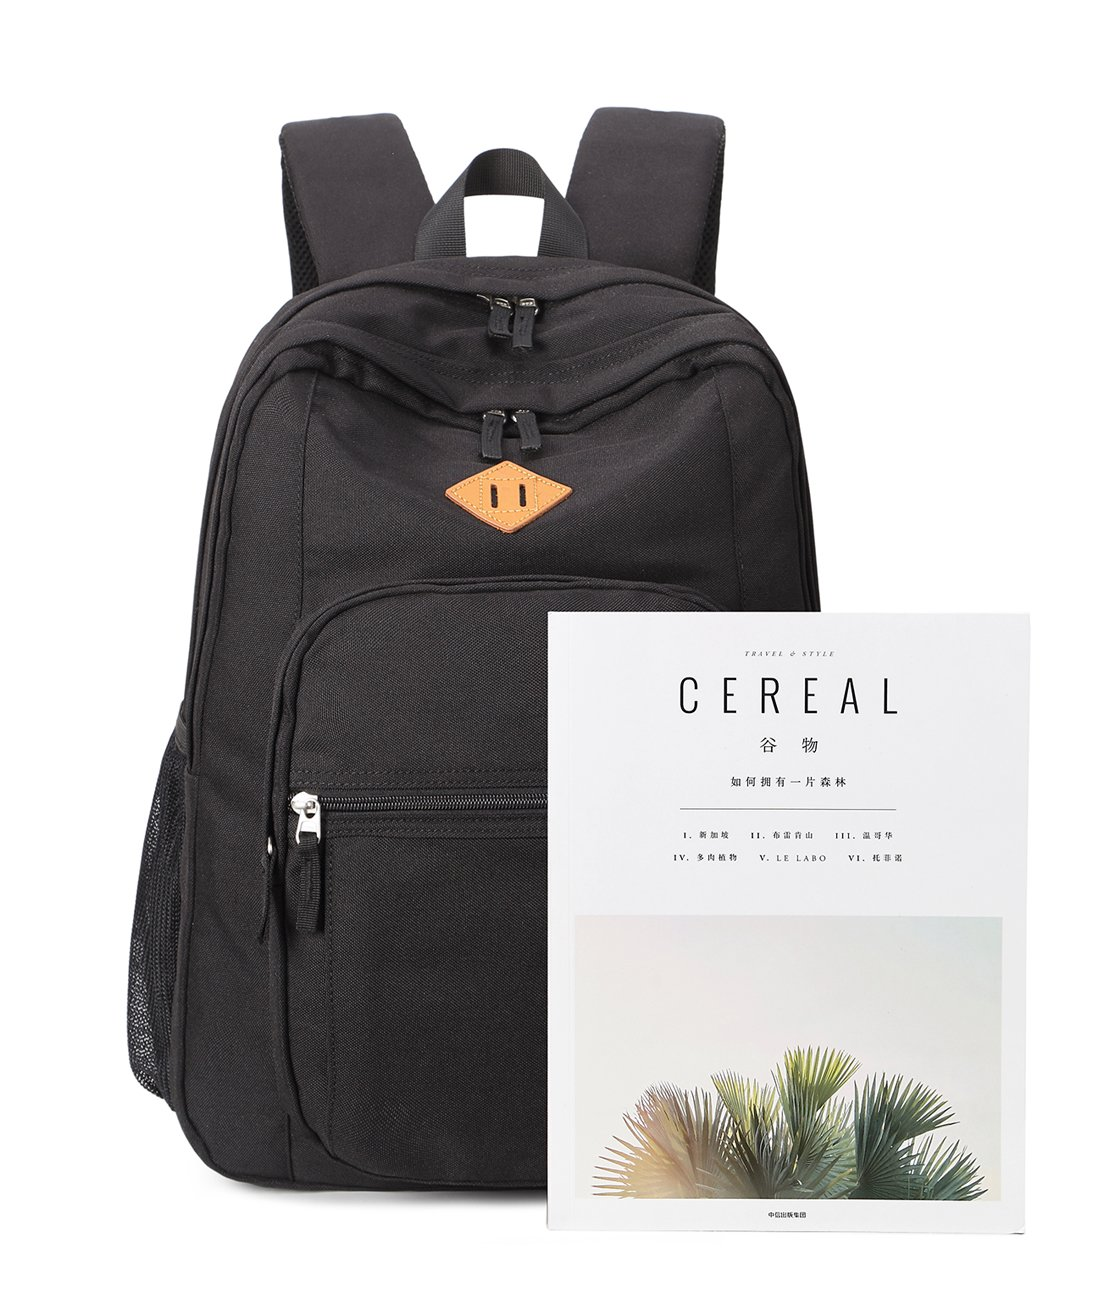 545f4ee87010 Abshoo Classical Basic Travel Backpack For School Water Resistant Bookbag